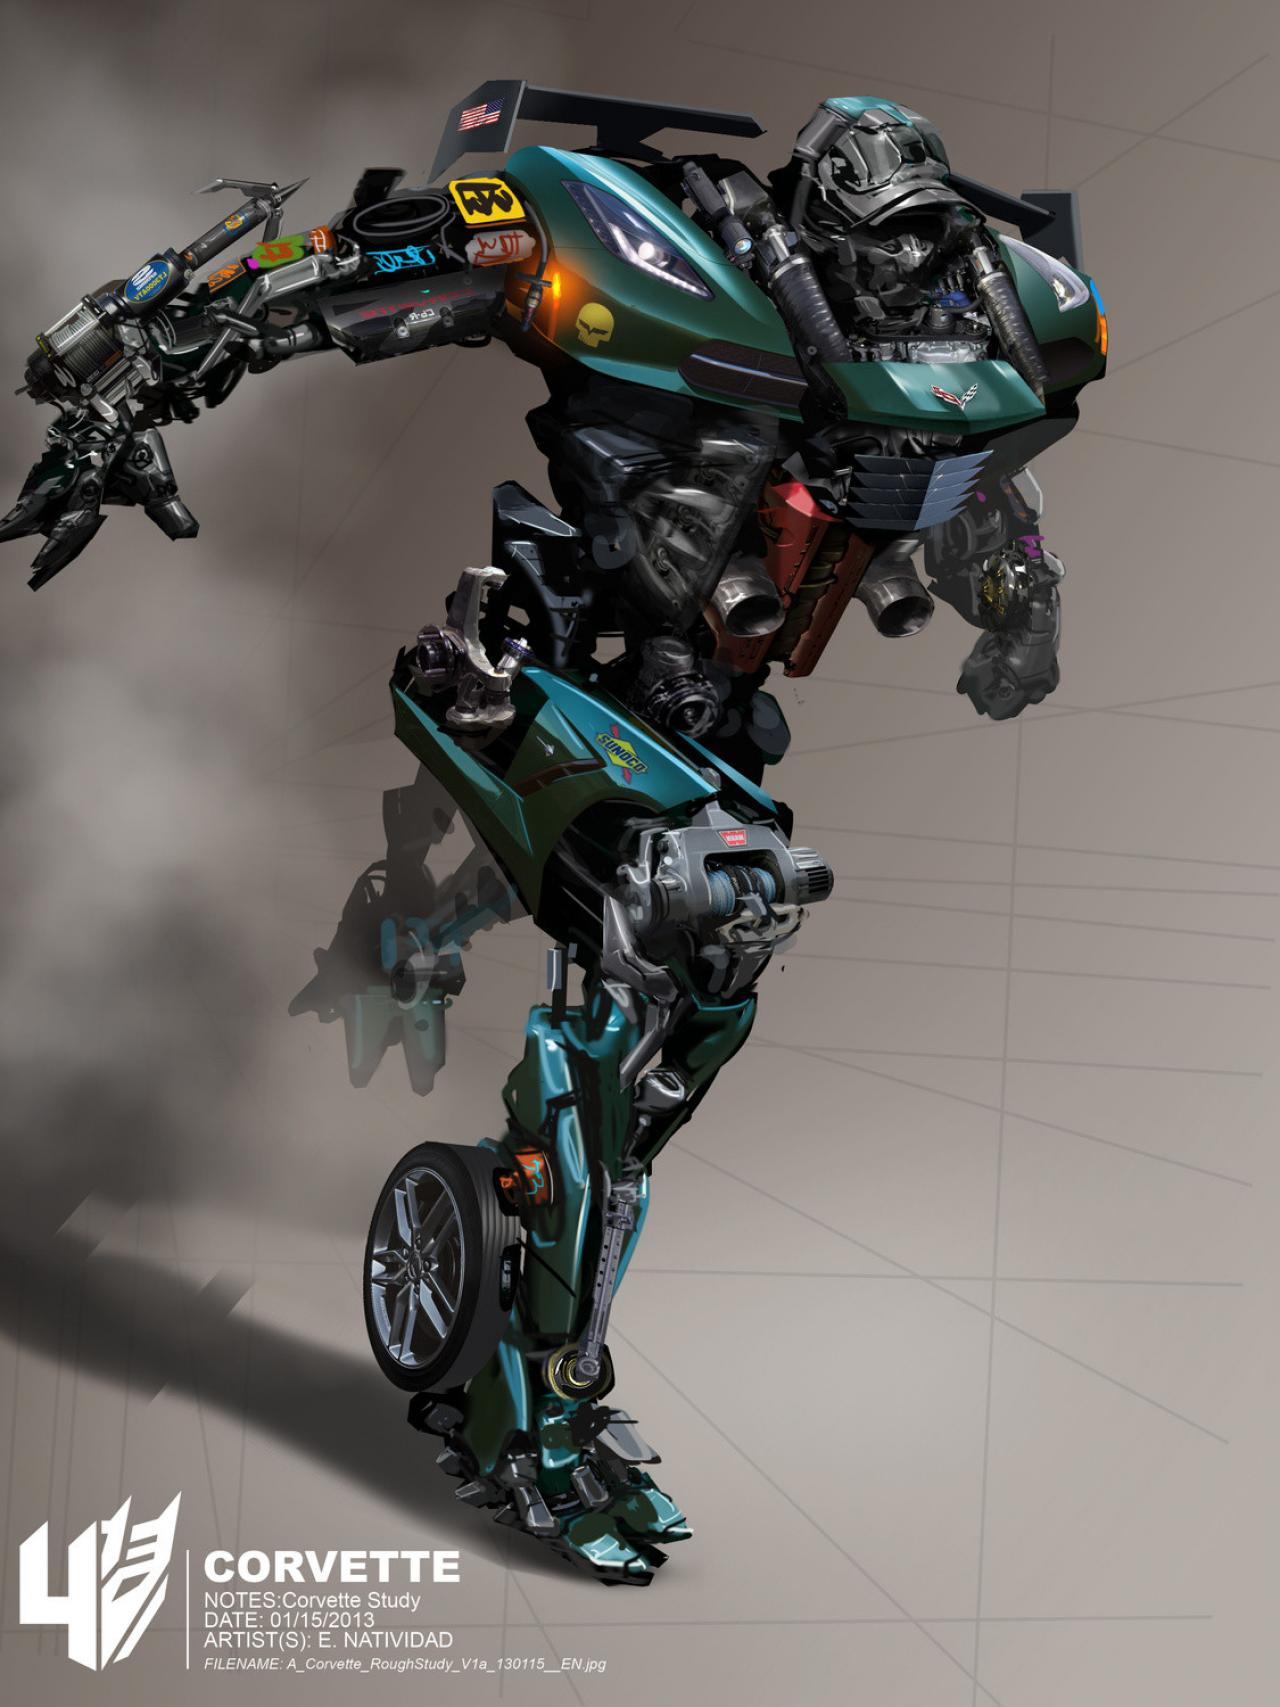 Dinobot Transformers Scorn likewise Tf Chicagobluecrossbuilding further Huracan Corvette Miata And Others Rendered As Base Models With Steel Wheels Lol together with Mv Bnjk Otczo  Nf Bml Banbnxkftztcwnjq Nzmzmw V Uy Cr Al additionally New Ford Figo Sedan Study. on transformers 4 cars names